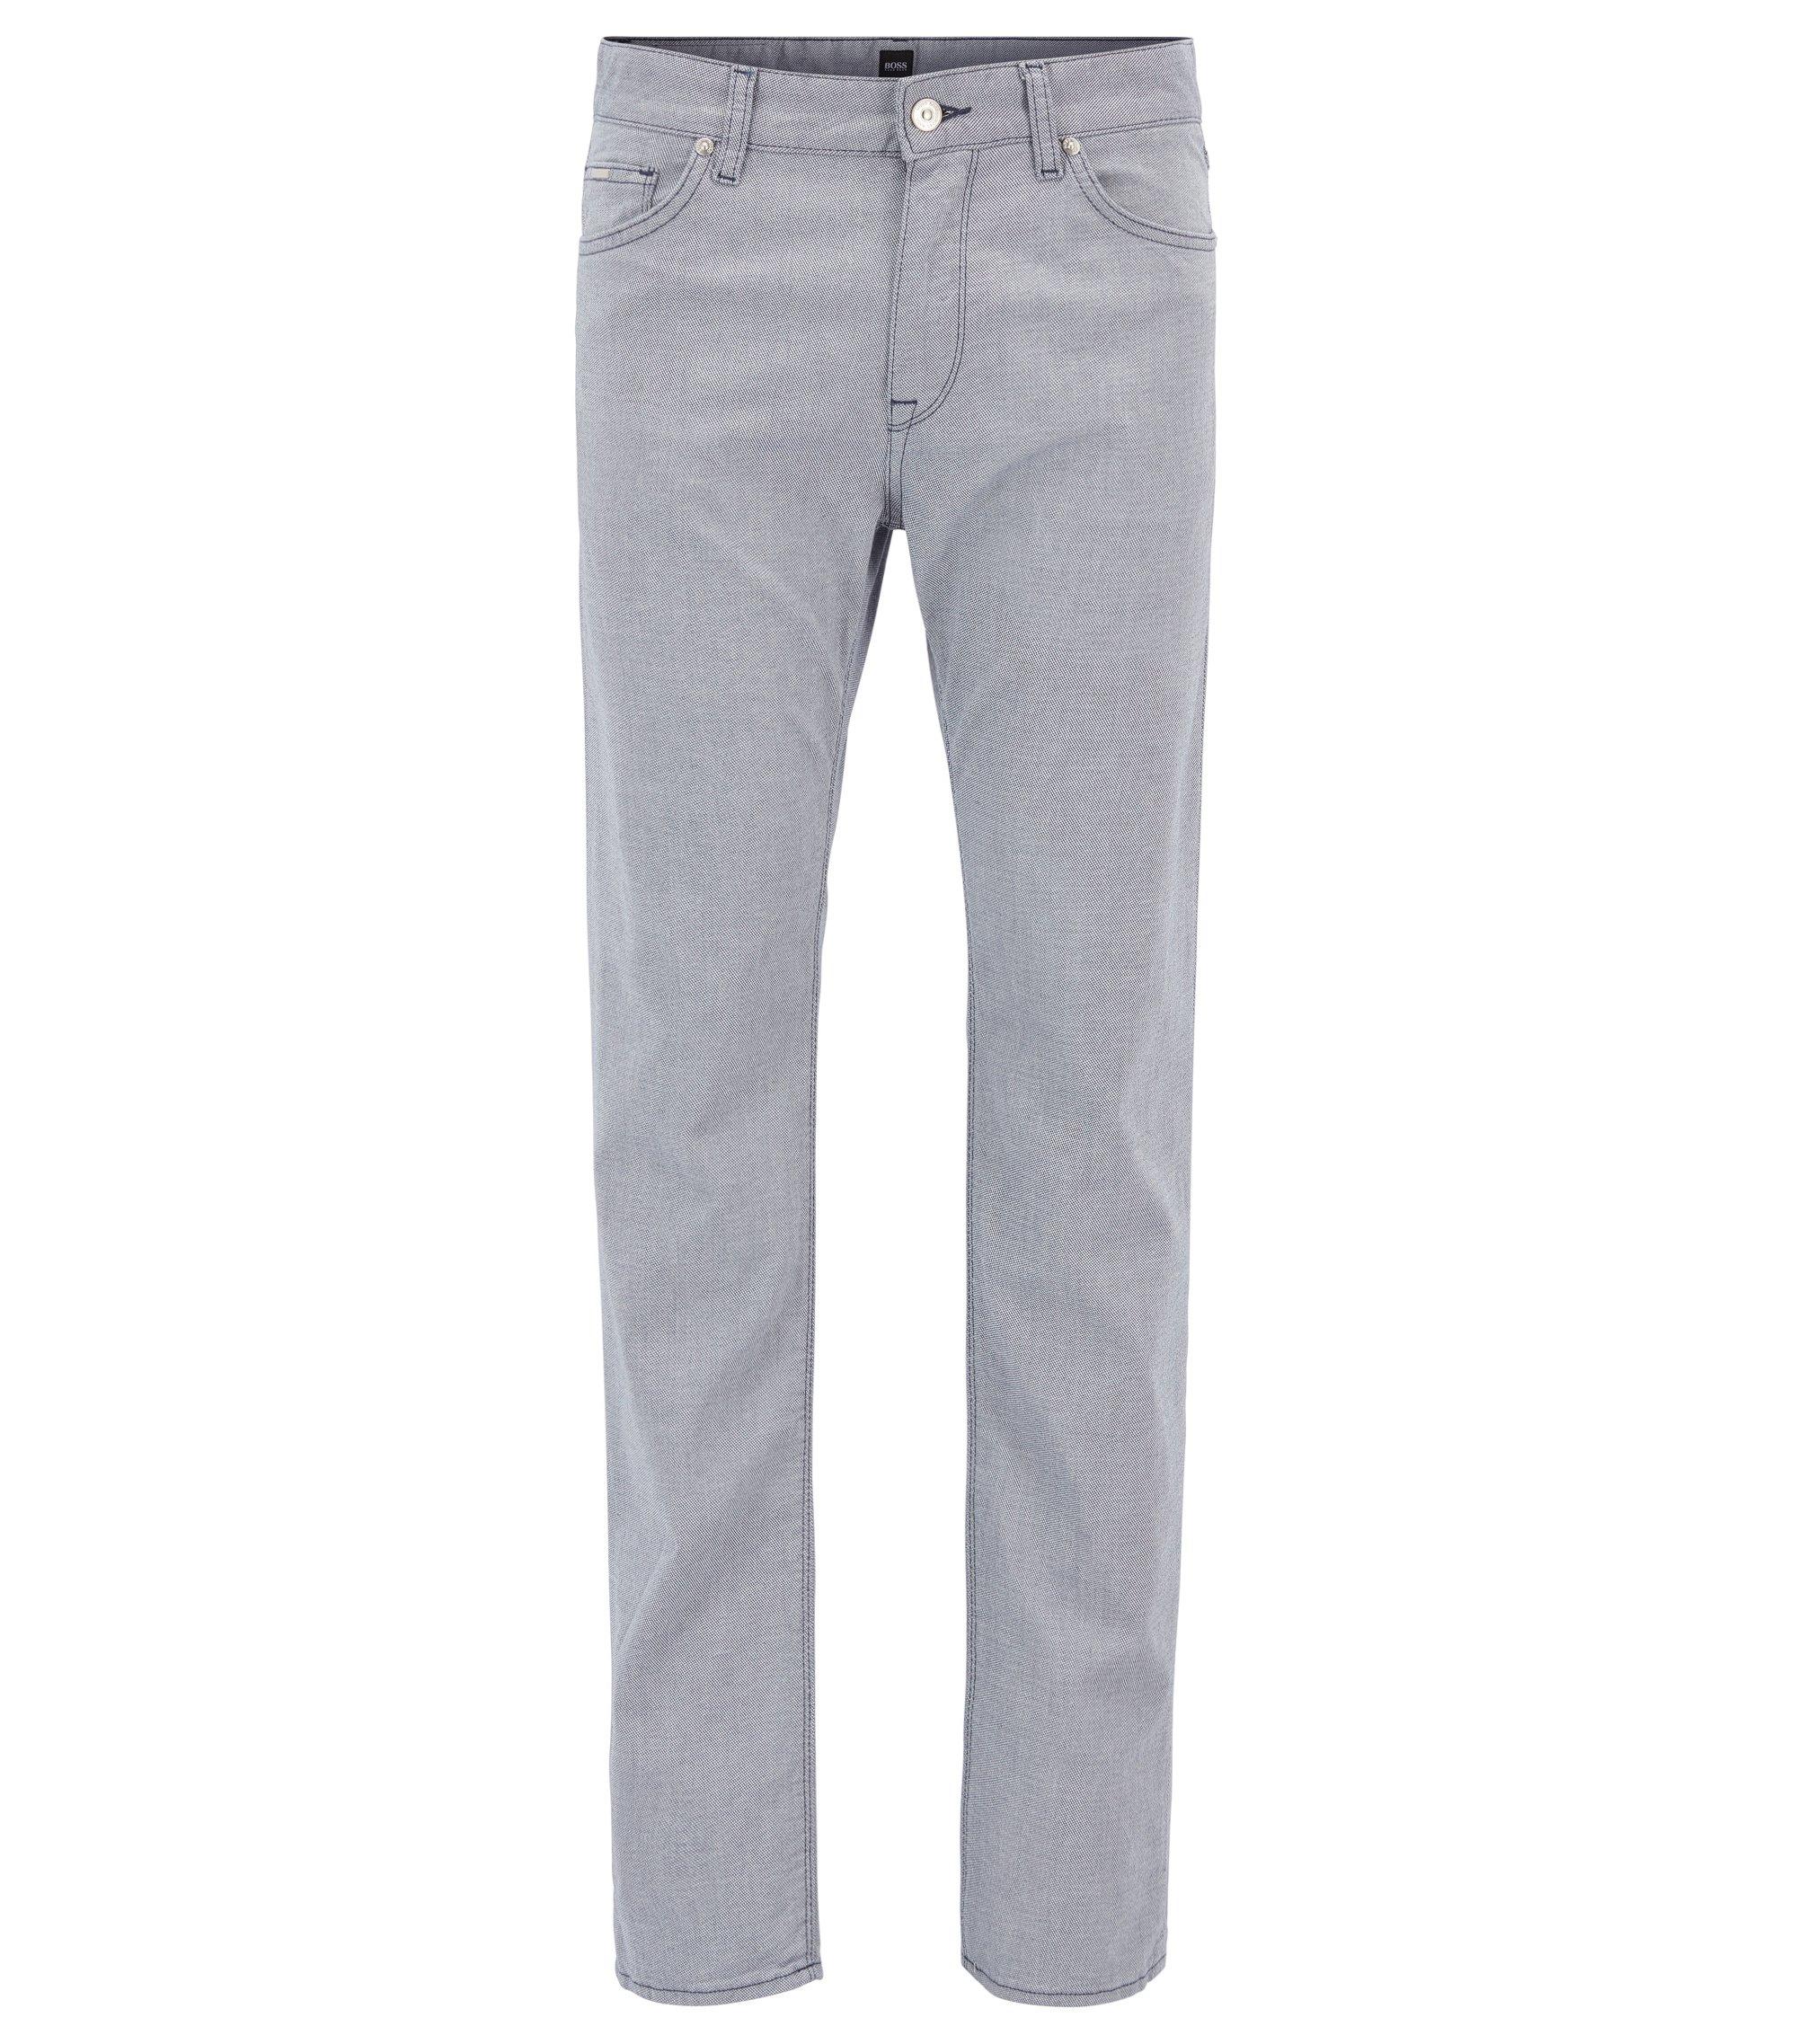 Stretch Cotton Pant, Regular Fit   Maine, Open Blue